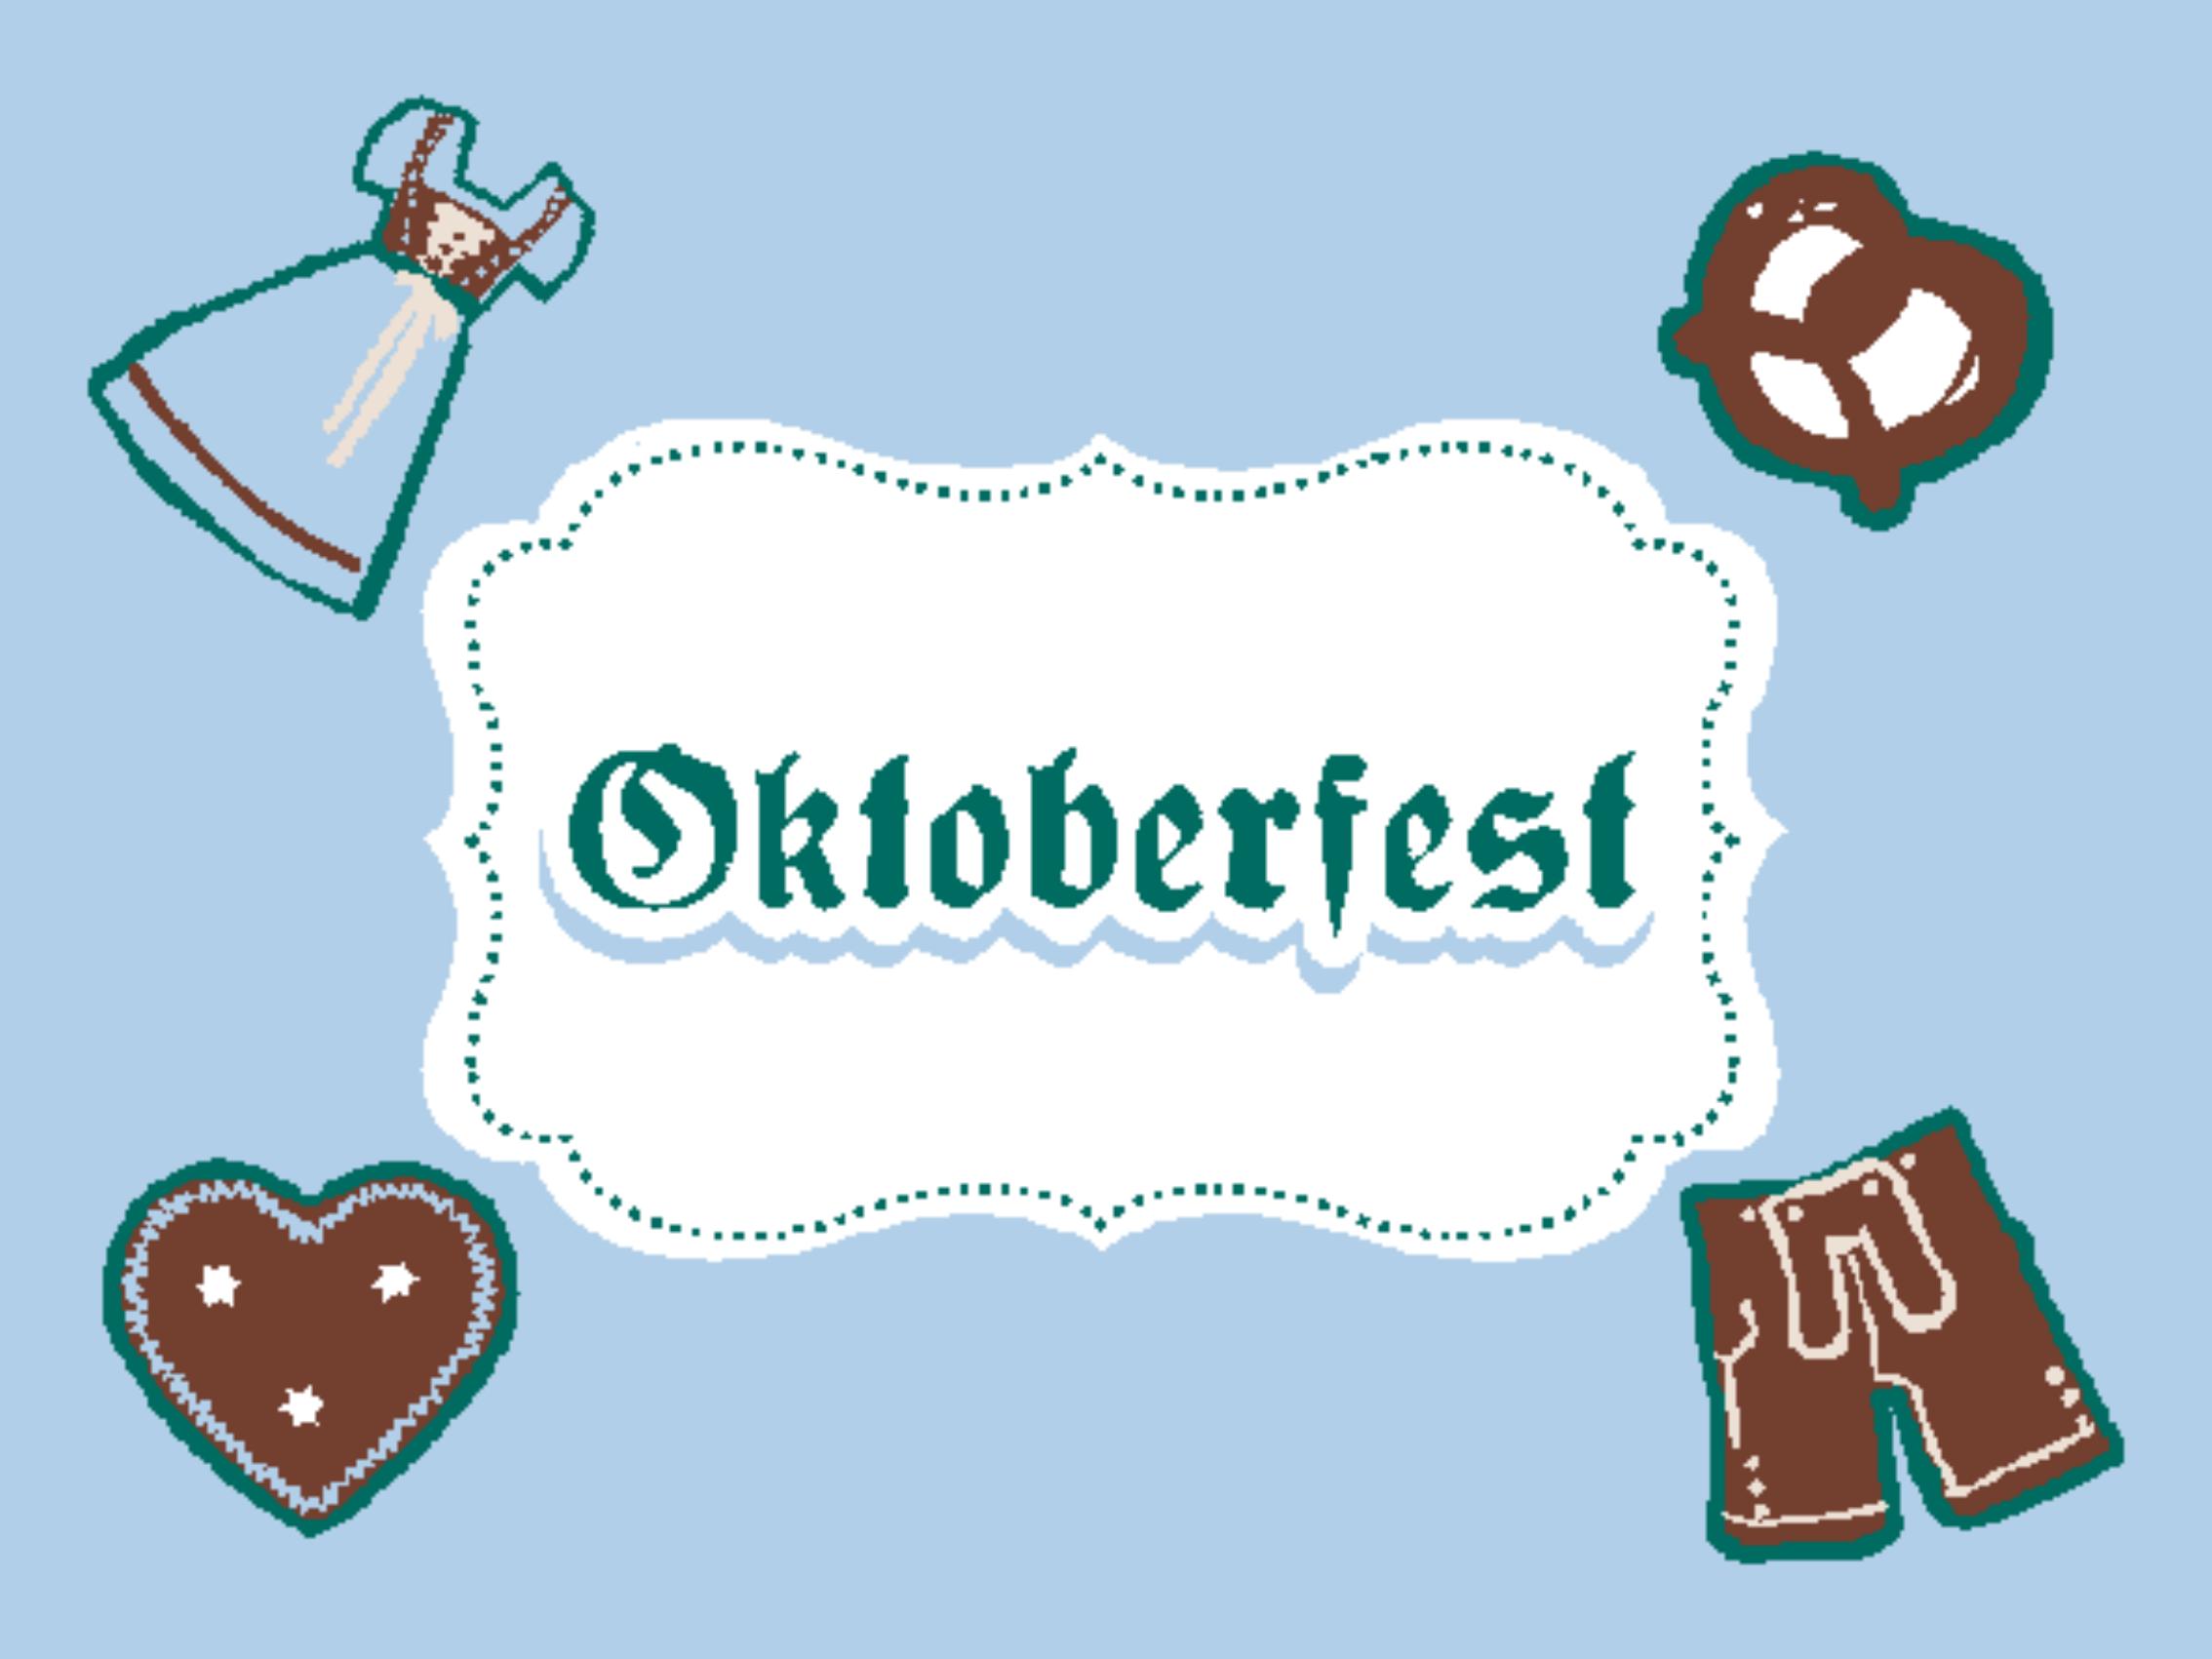 Oktoberfest 999-1654